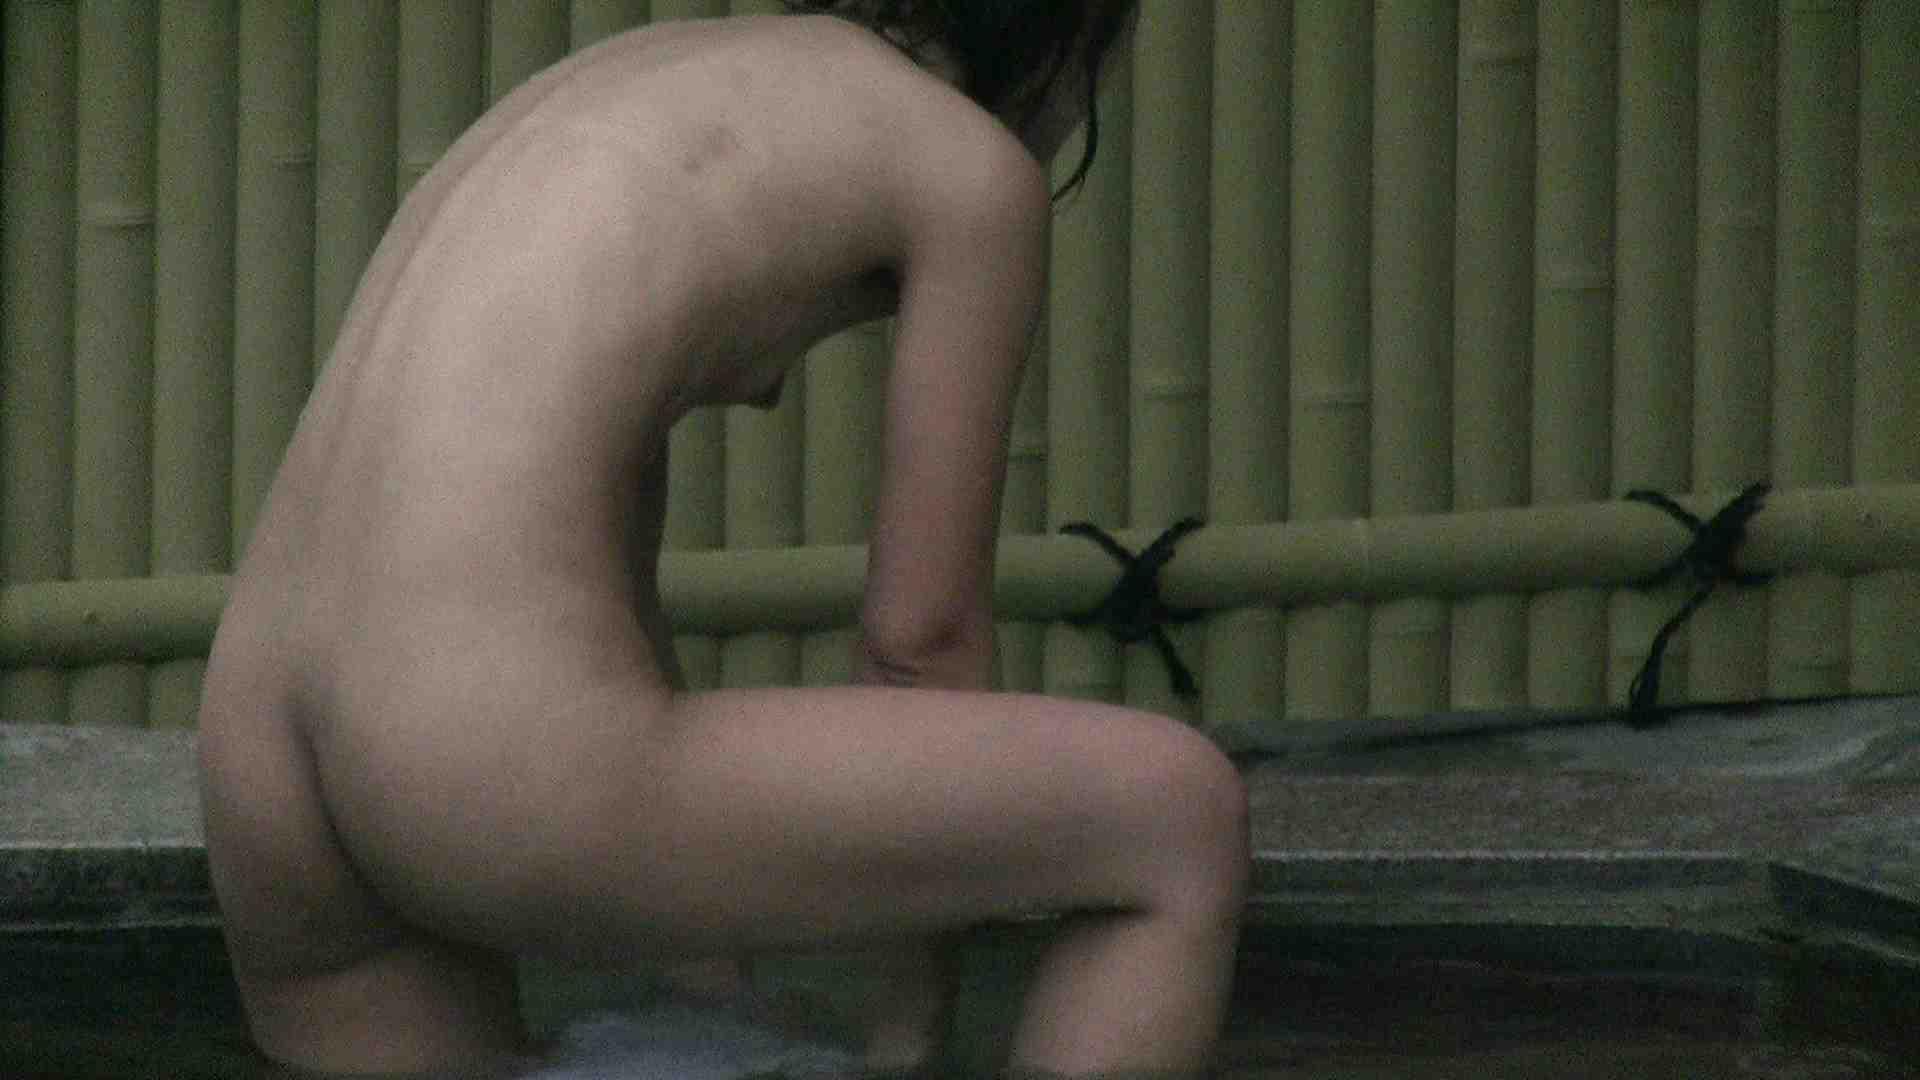 Aquaな露天風呂Vol.159 OLのプライベート | 盗撮特撮  13pic 13